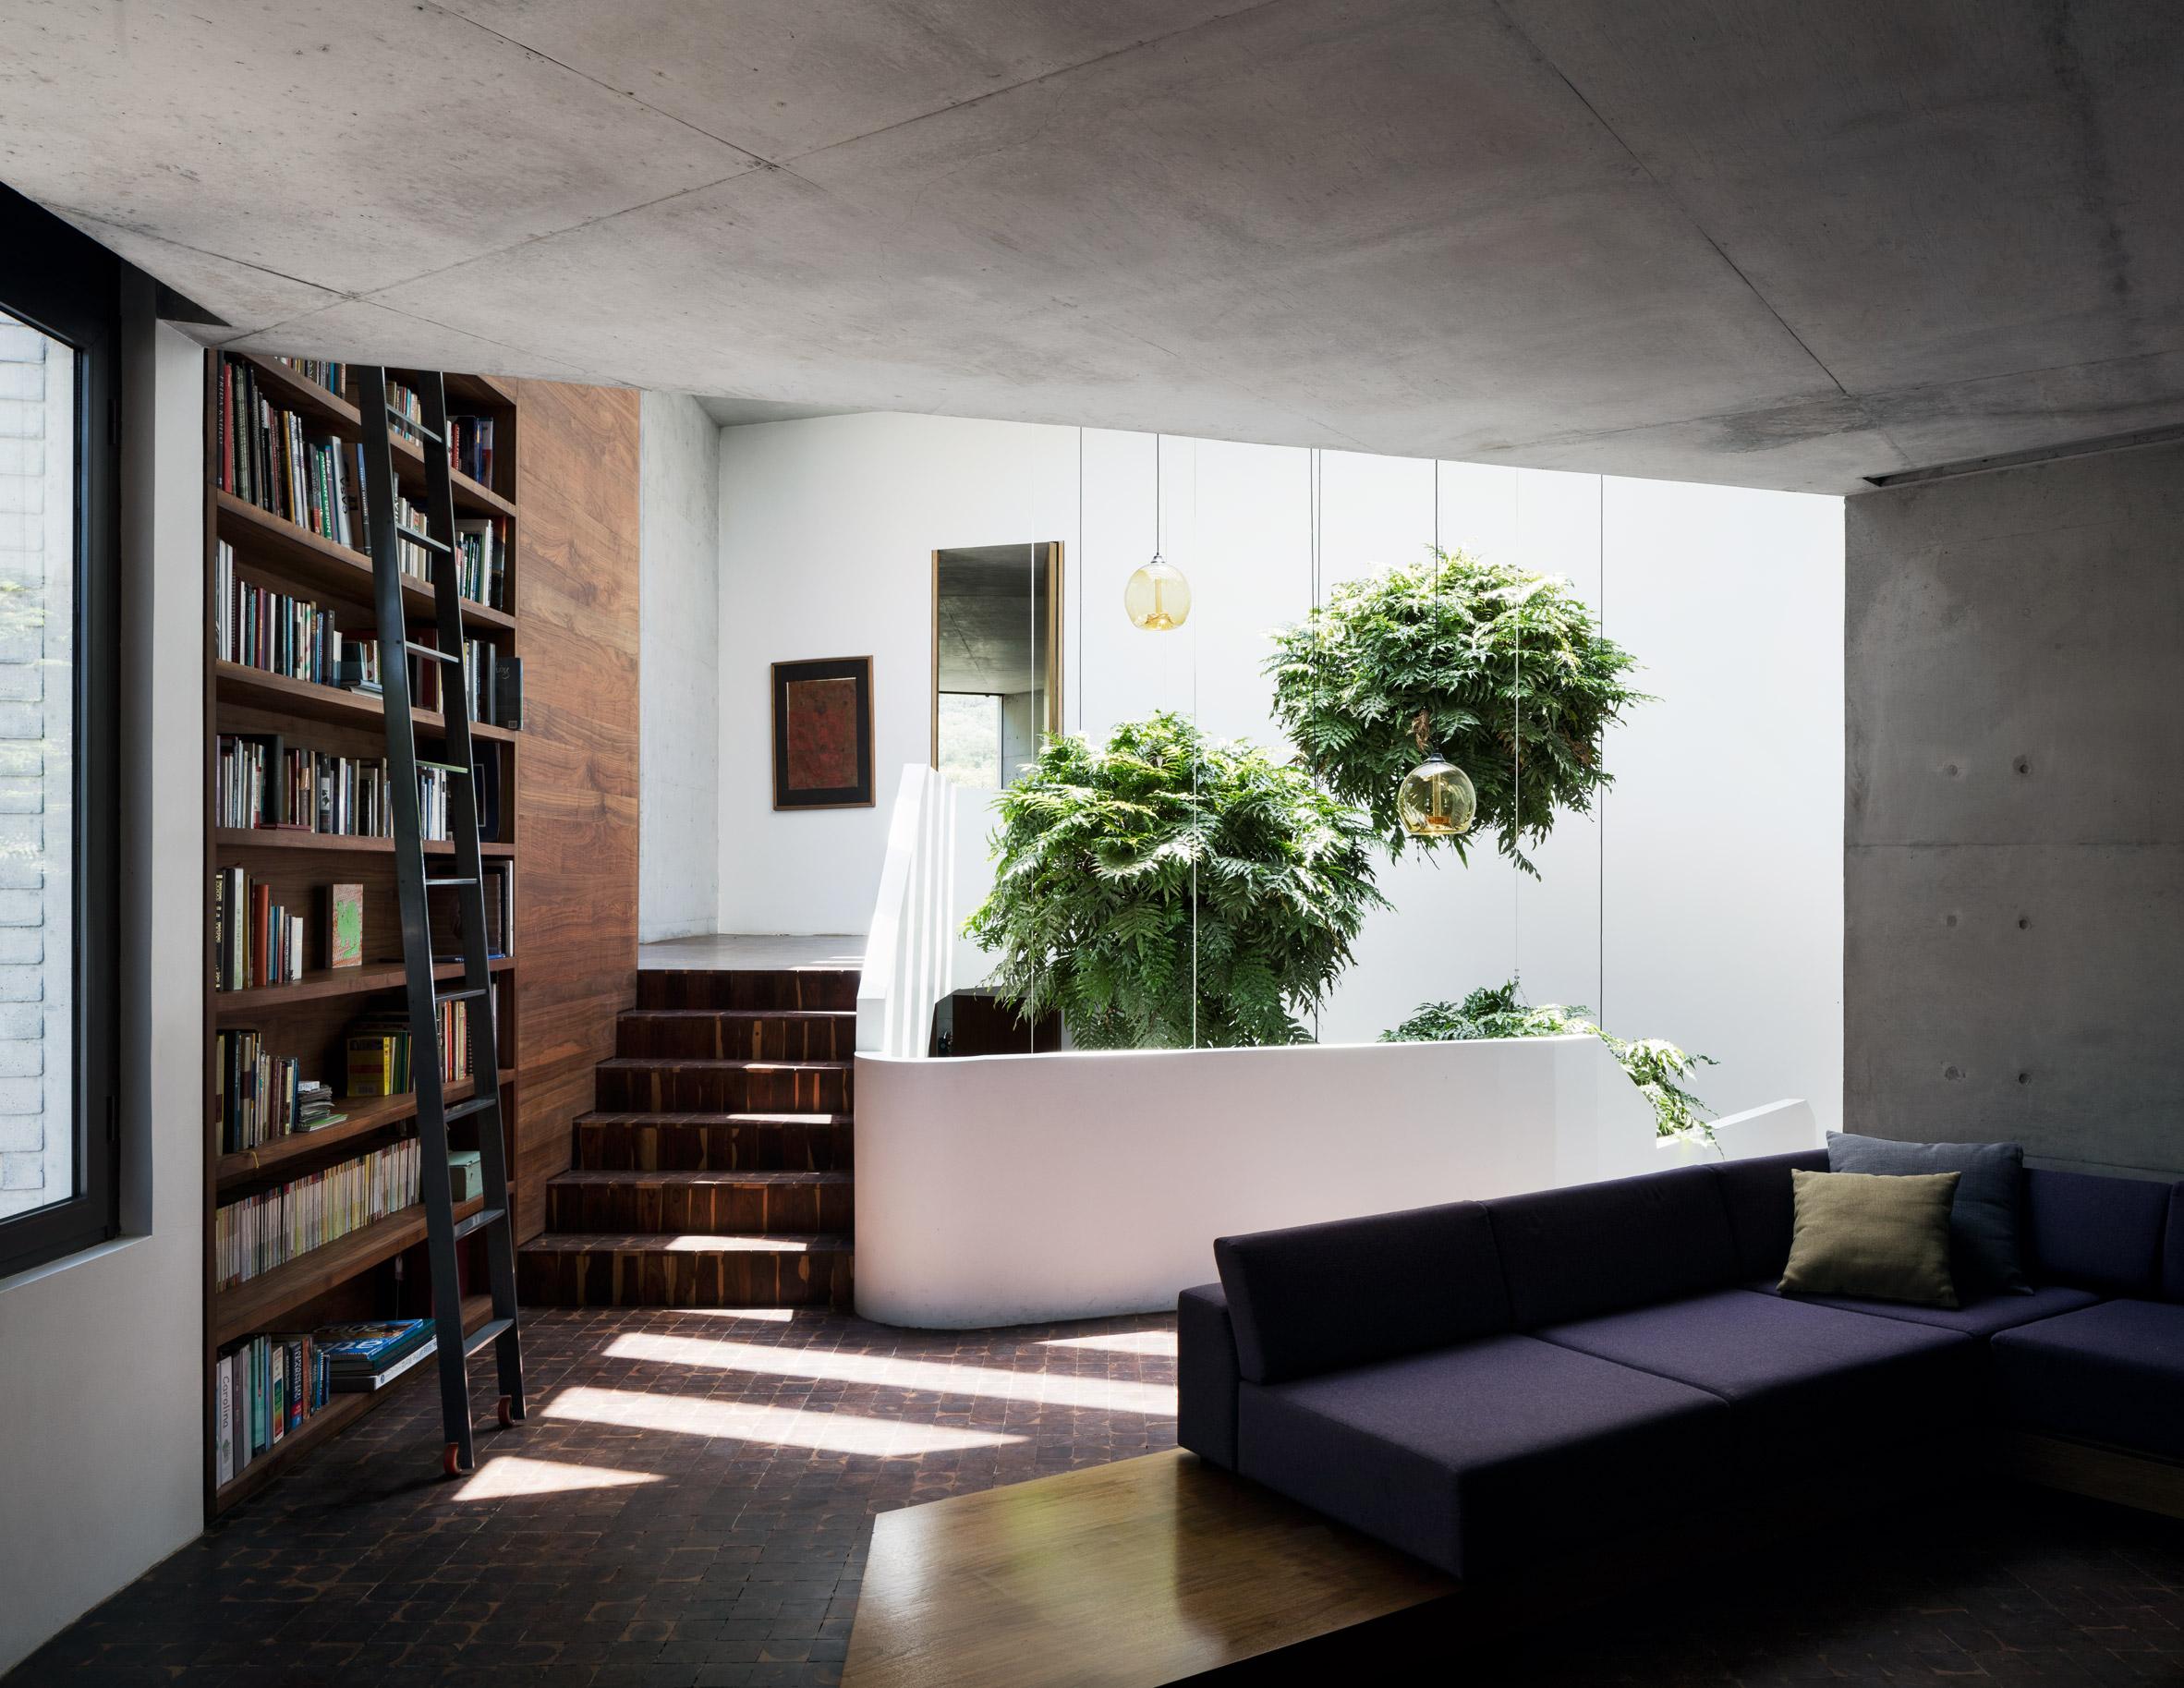 Cantilevered modern stunner nods to LA's hillside homes